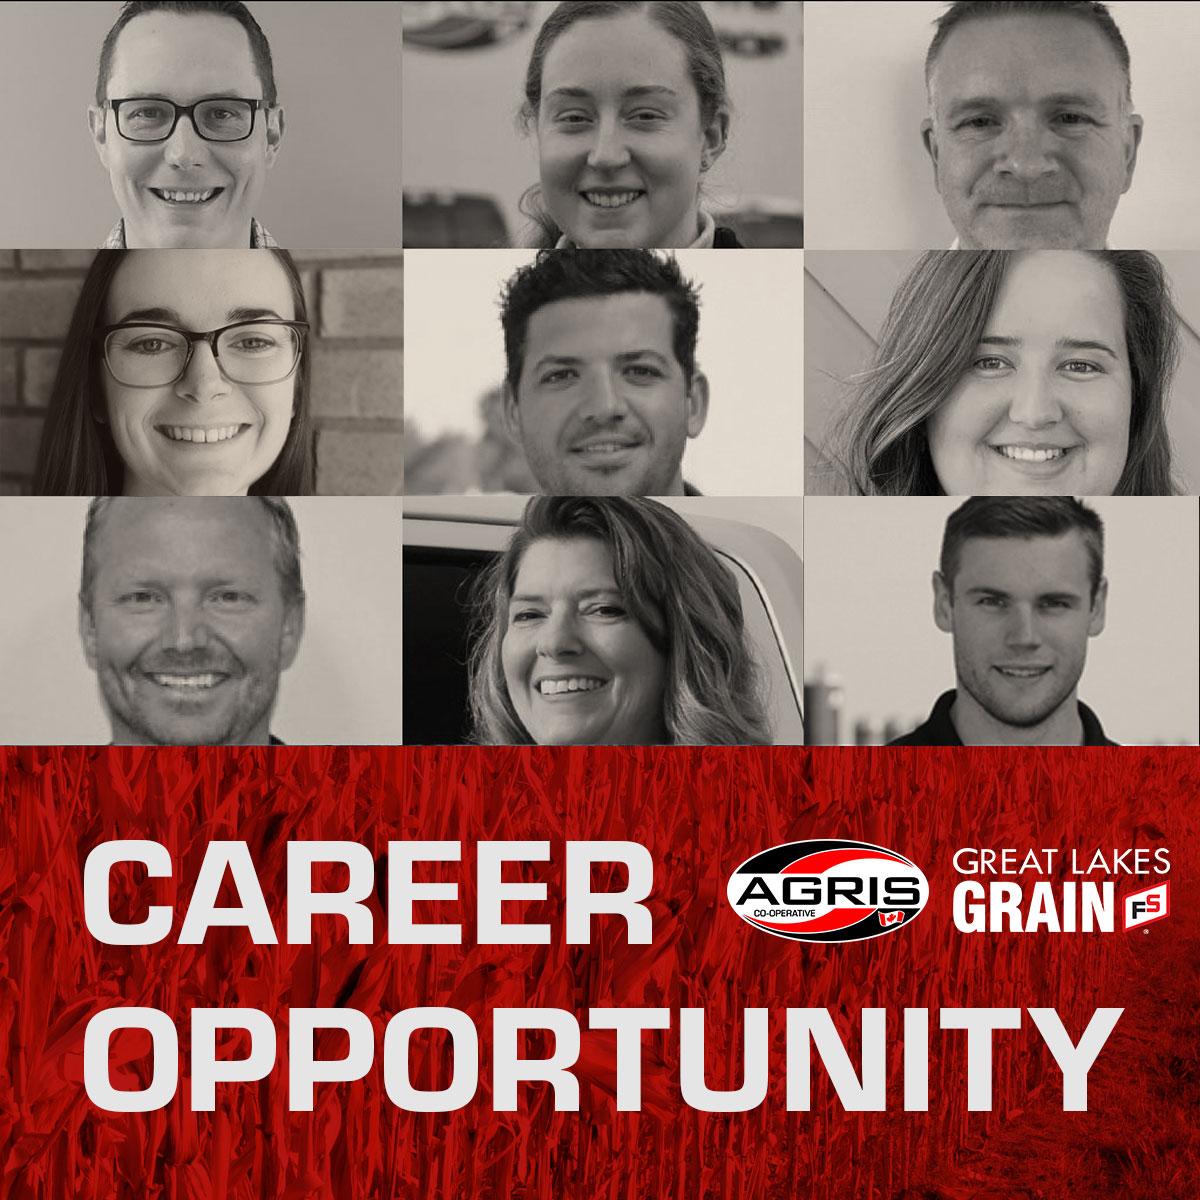 HR_Careers_AGRIS-GLG_CareerOpportunity_April2021.jpg